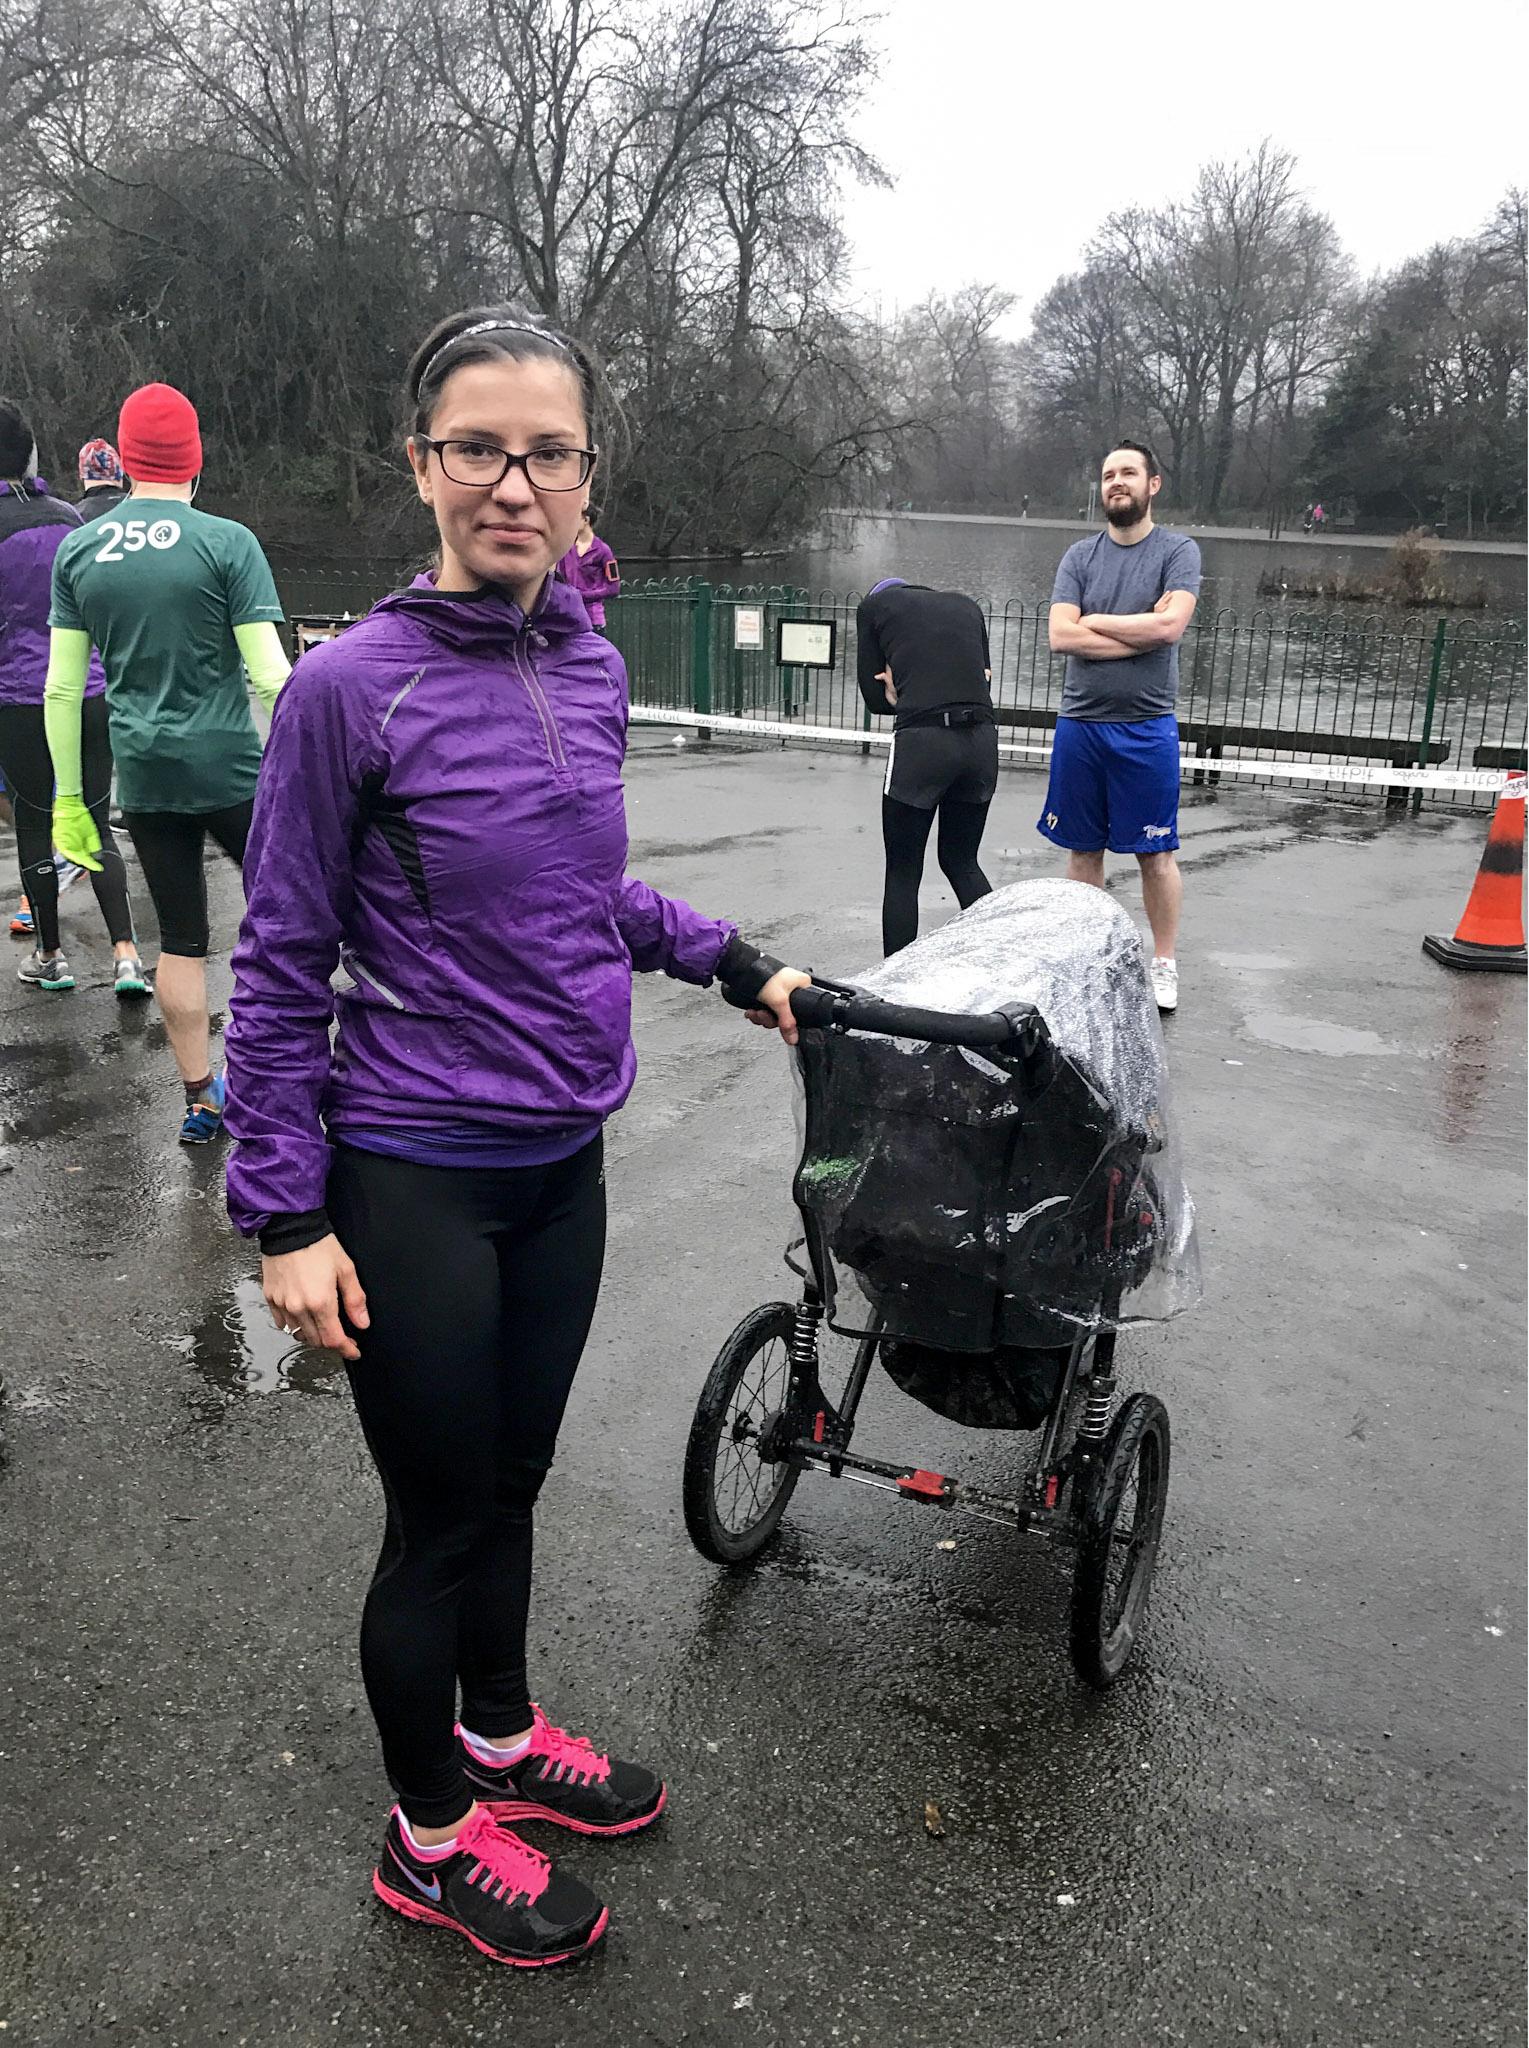 Our first half marathon: Why we chose a training plan